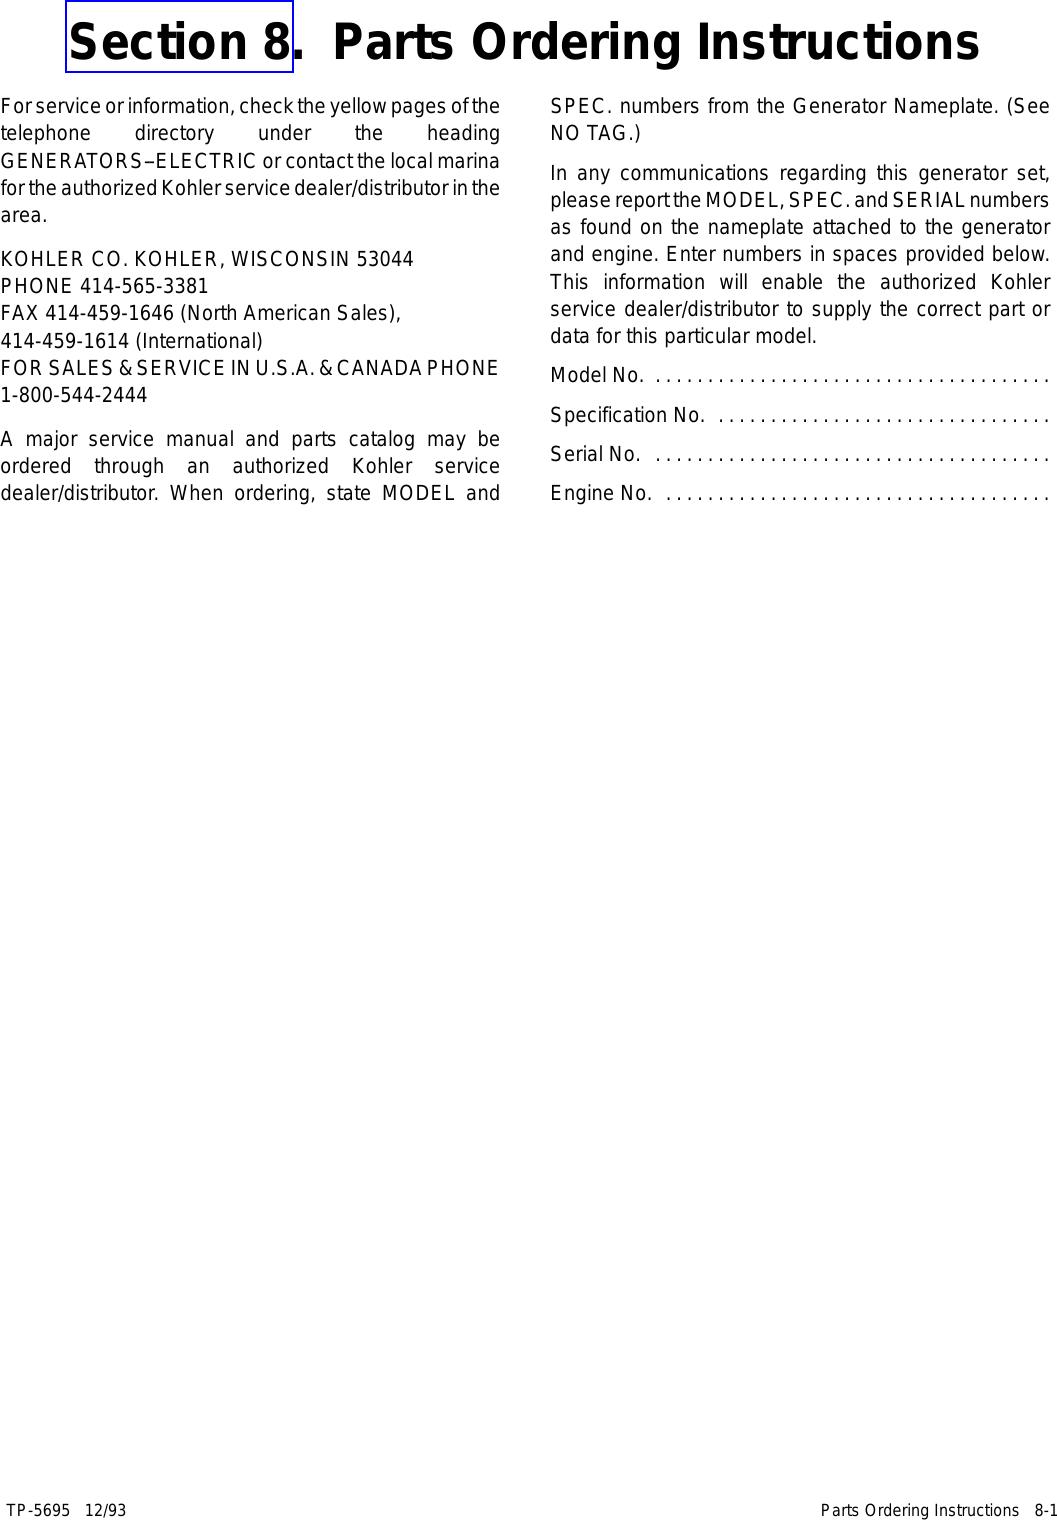 Kohler 3 5Cfz 4Cz 6 5Cz Users Manual Operation Manual, 4/6 5CZ 3 5